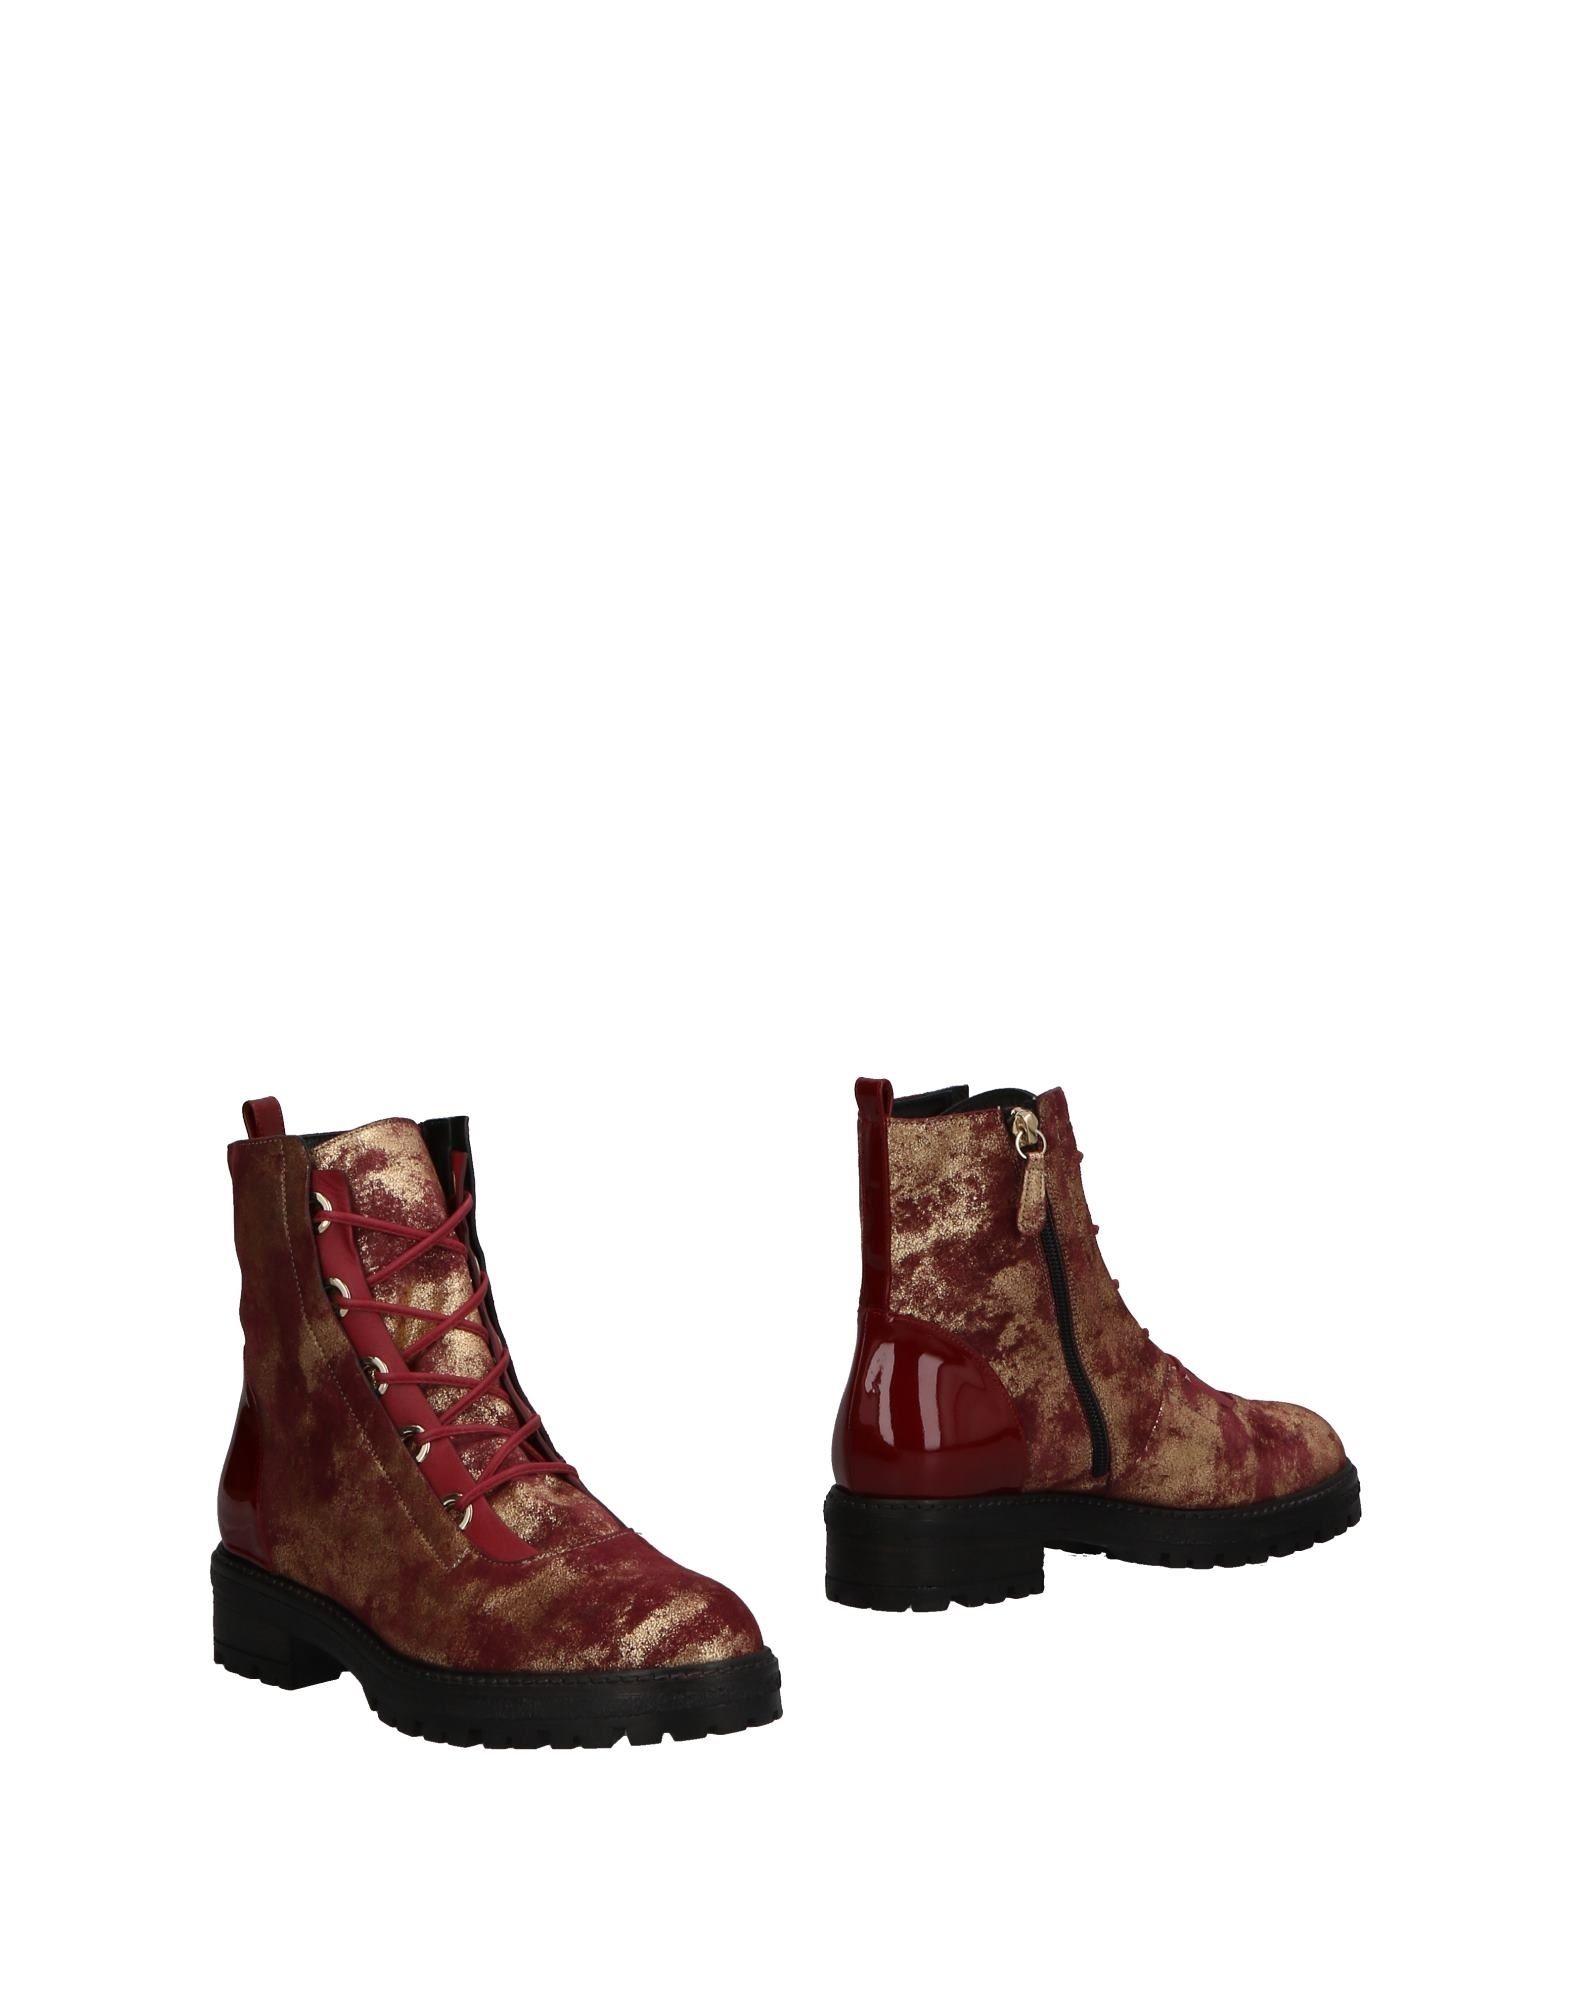 LELLA BALDI Ankle Boot in Maroon